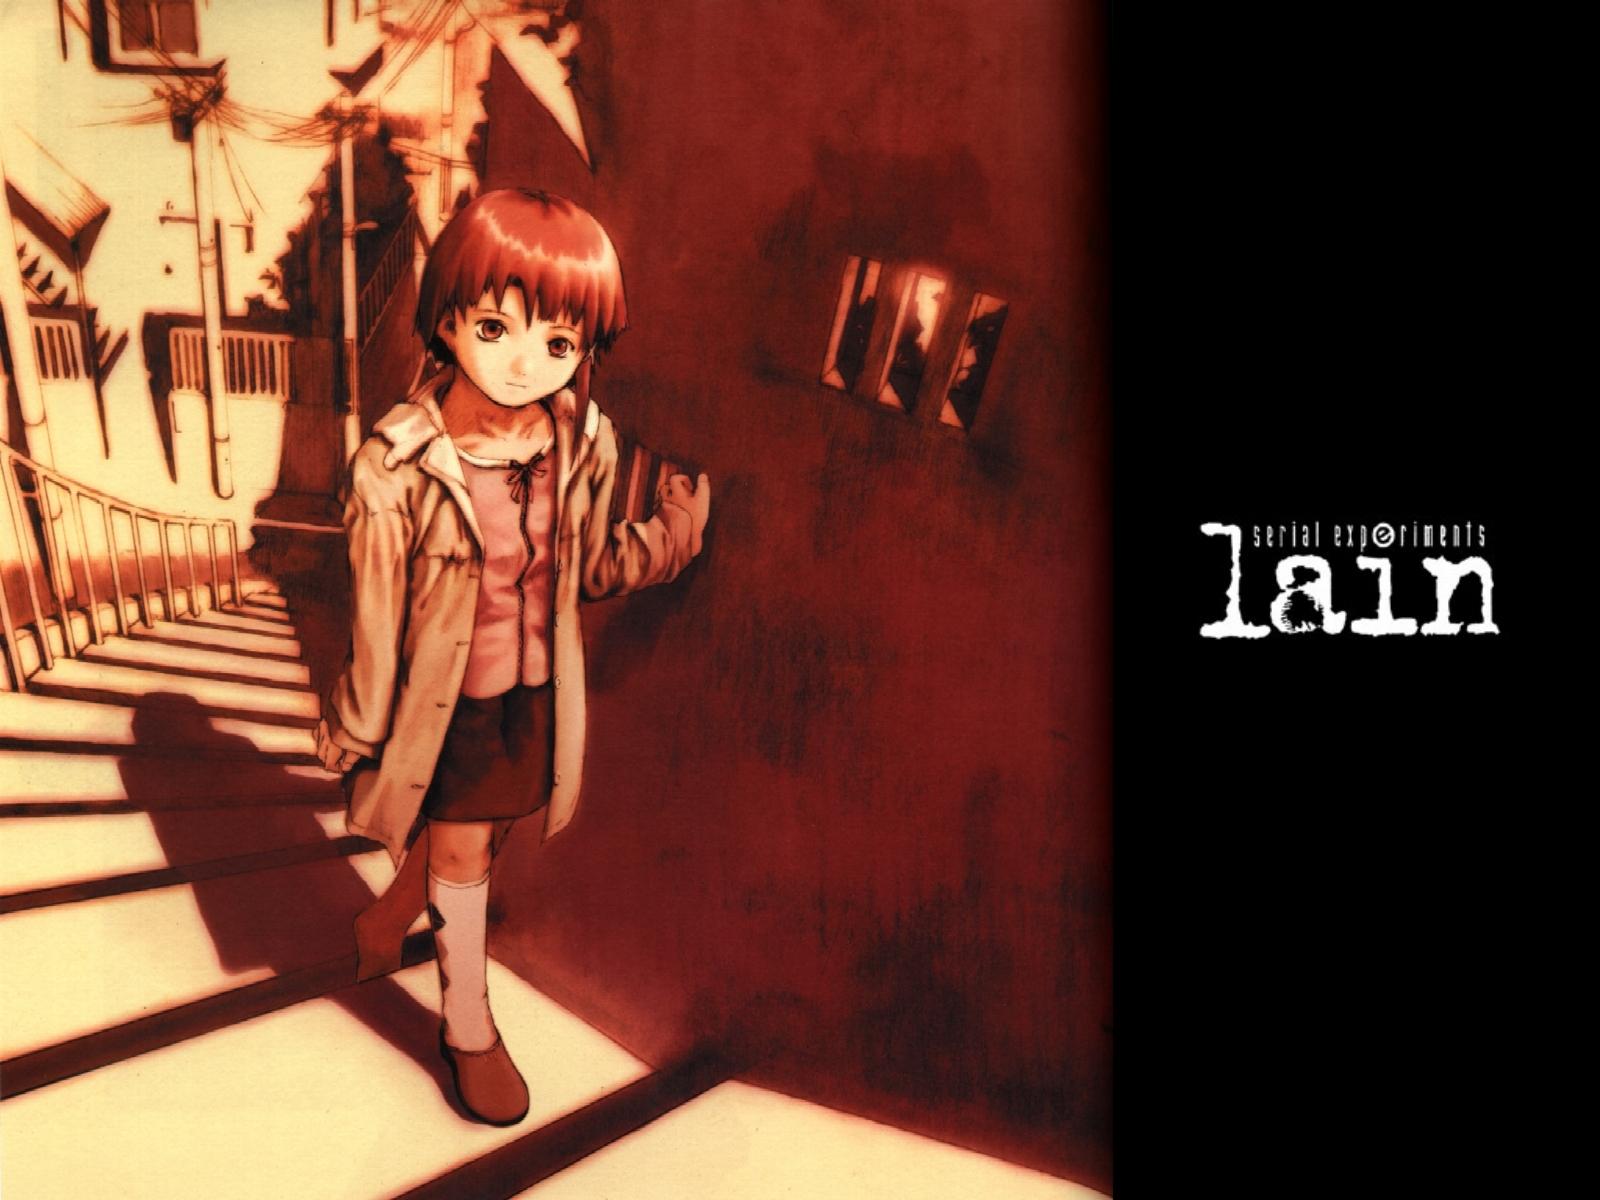 abe_yoshitoshi iwakura_lain kneehighs logo polychromatic scenic serial_experiments_lain short_hair skirt stairs